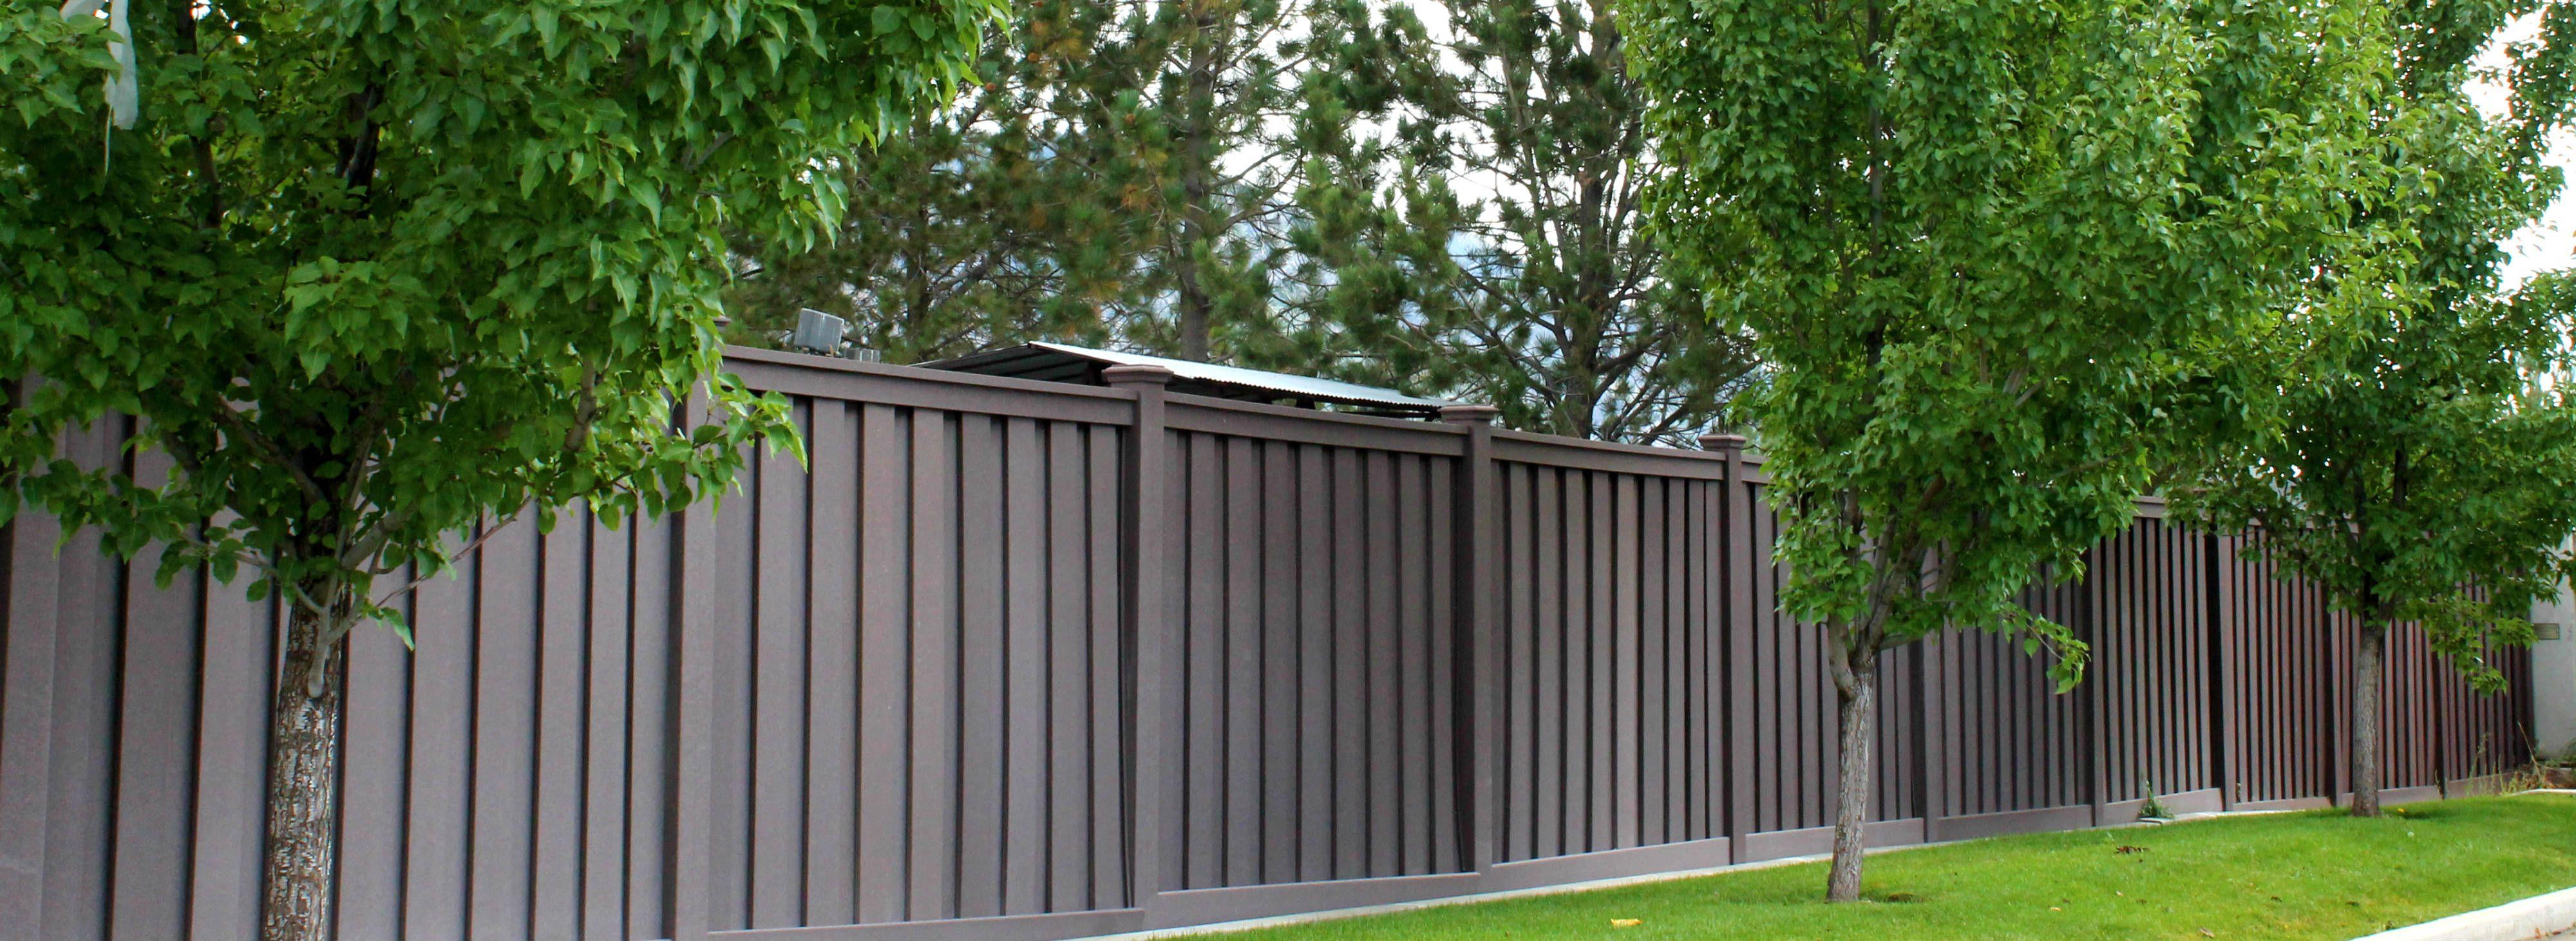 Trex Fencing posite mercial Installation